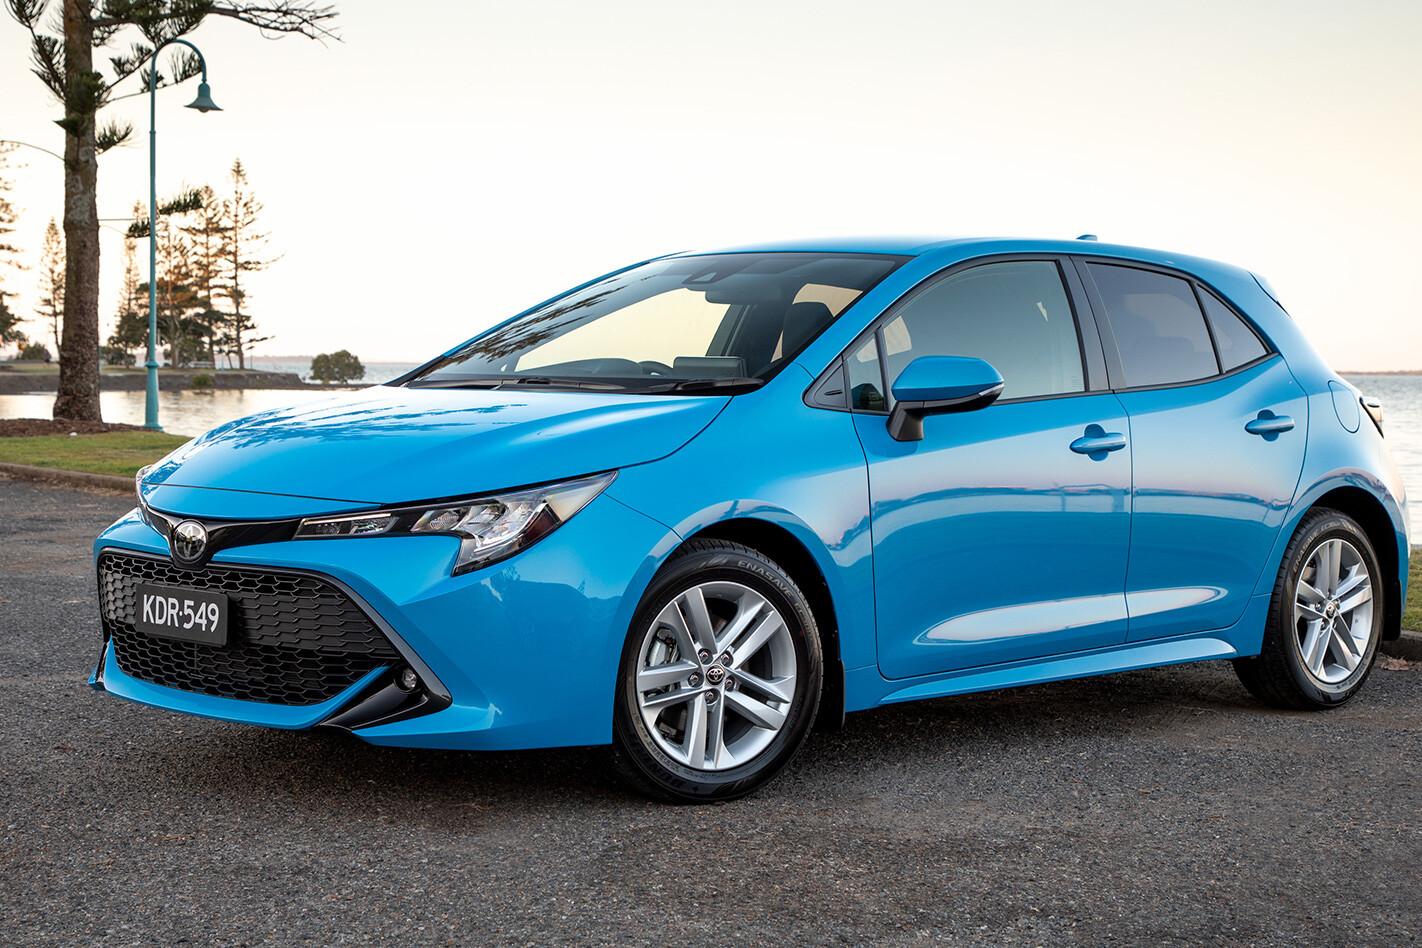 Toyota Corolla Blu Jpg